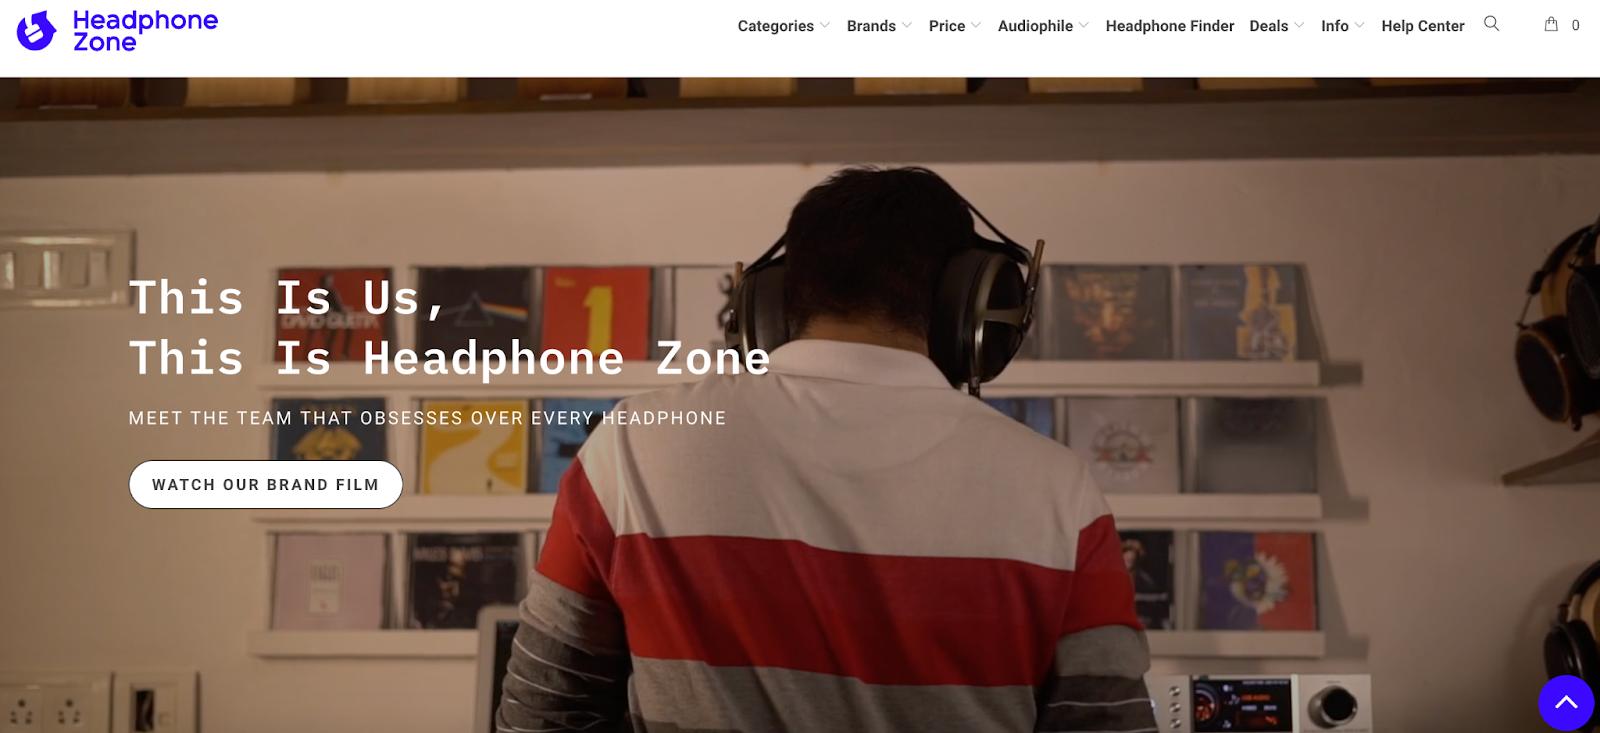 headphone zone example of product video